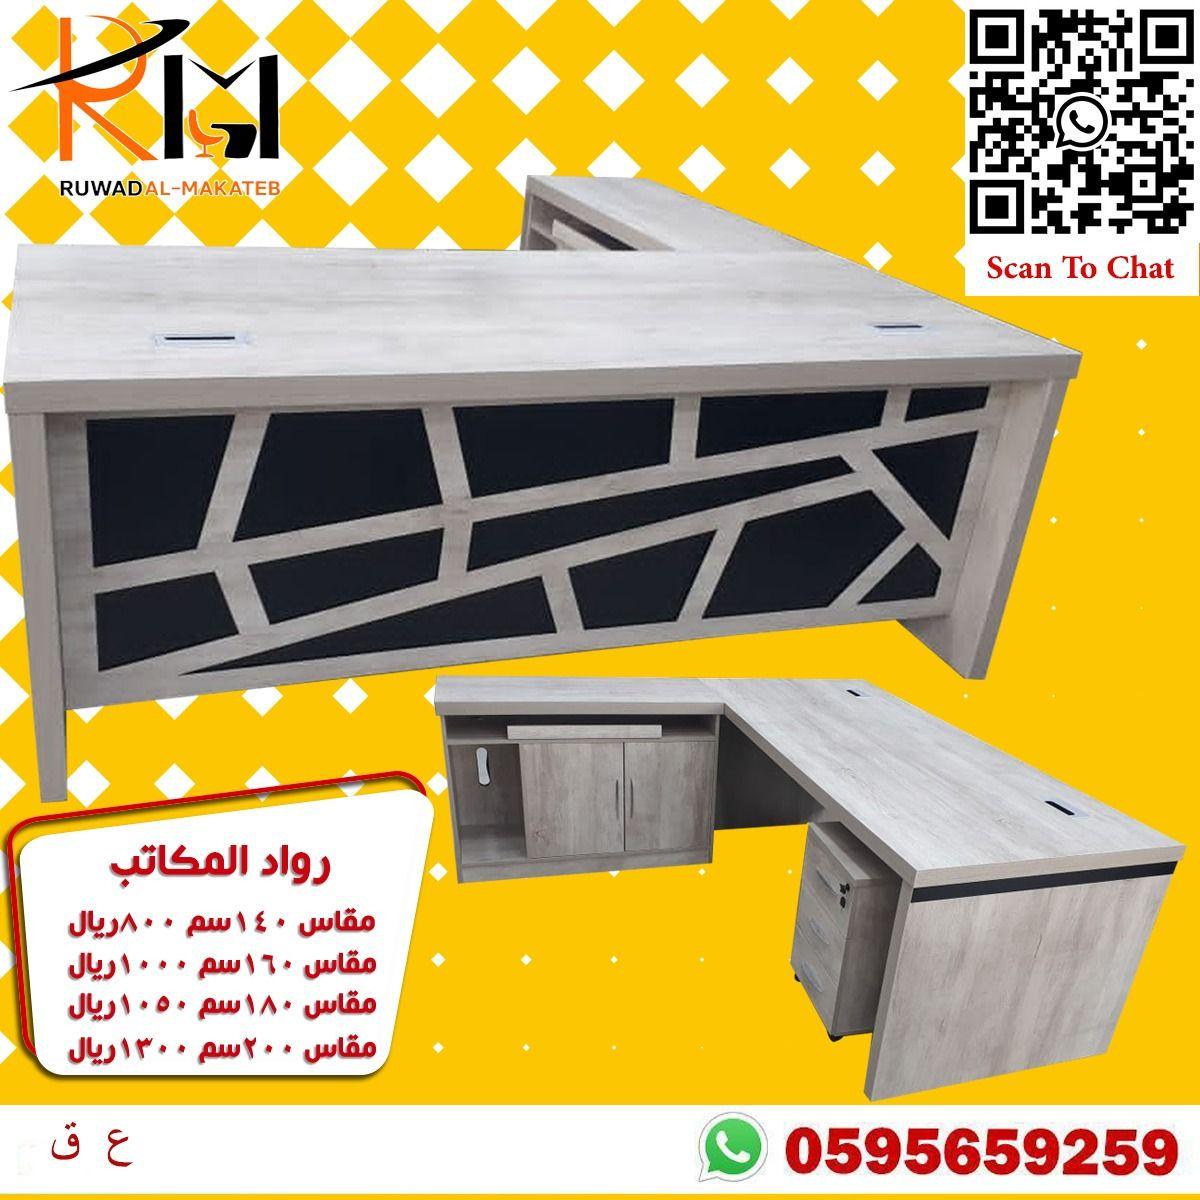 مكتب دولاب بسعر ممتاز Home Decor Storage Bench Furniture